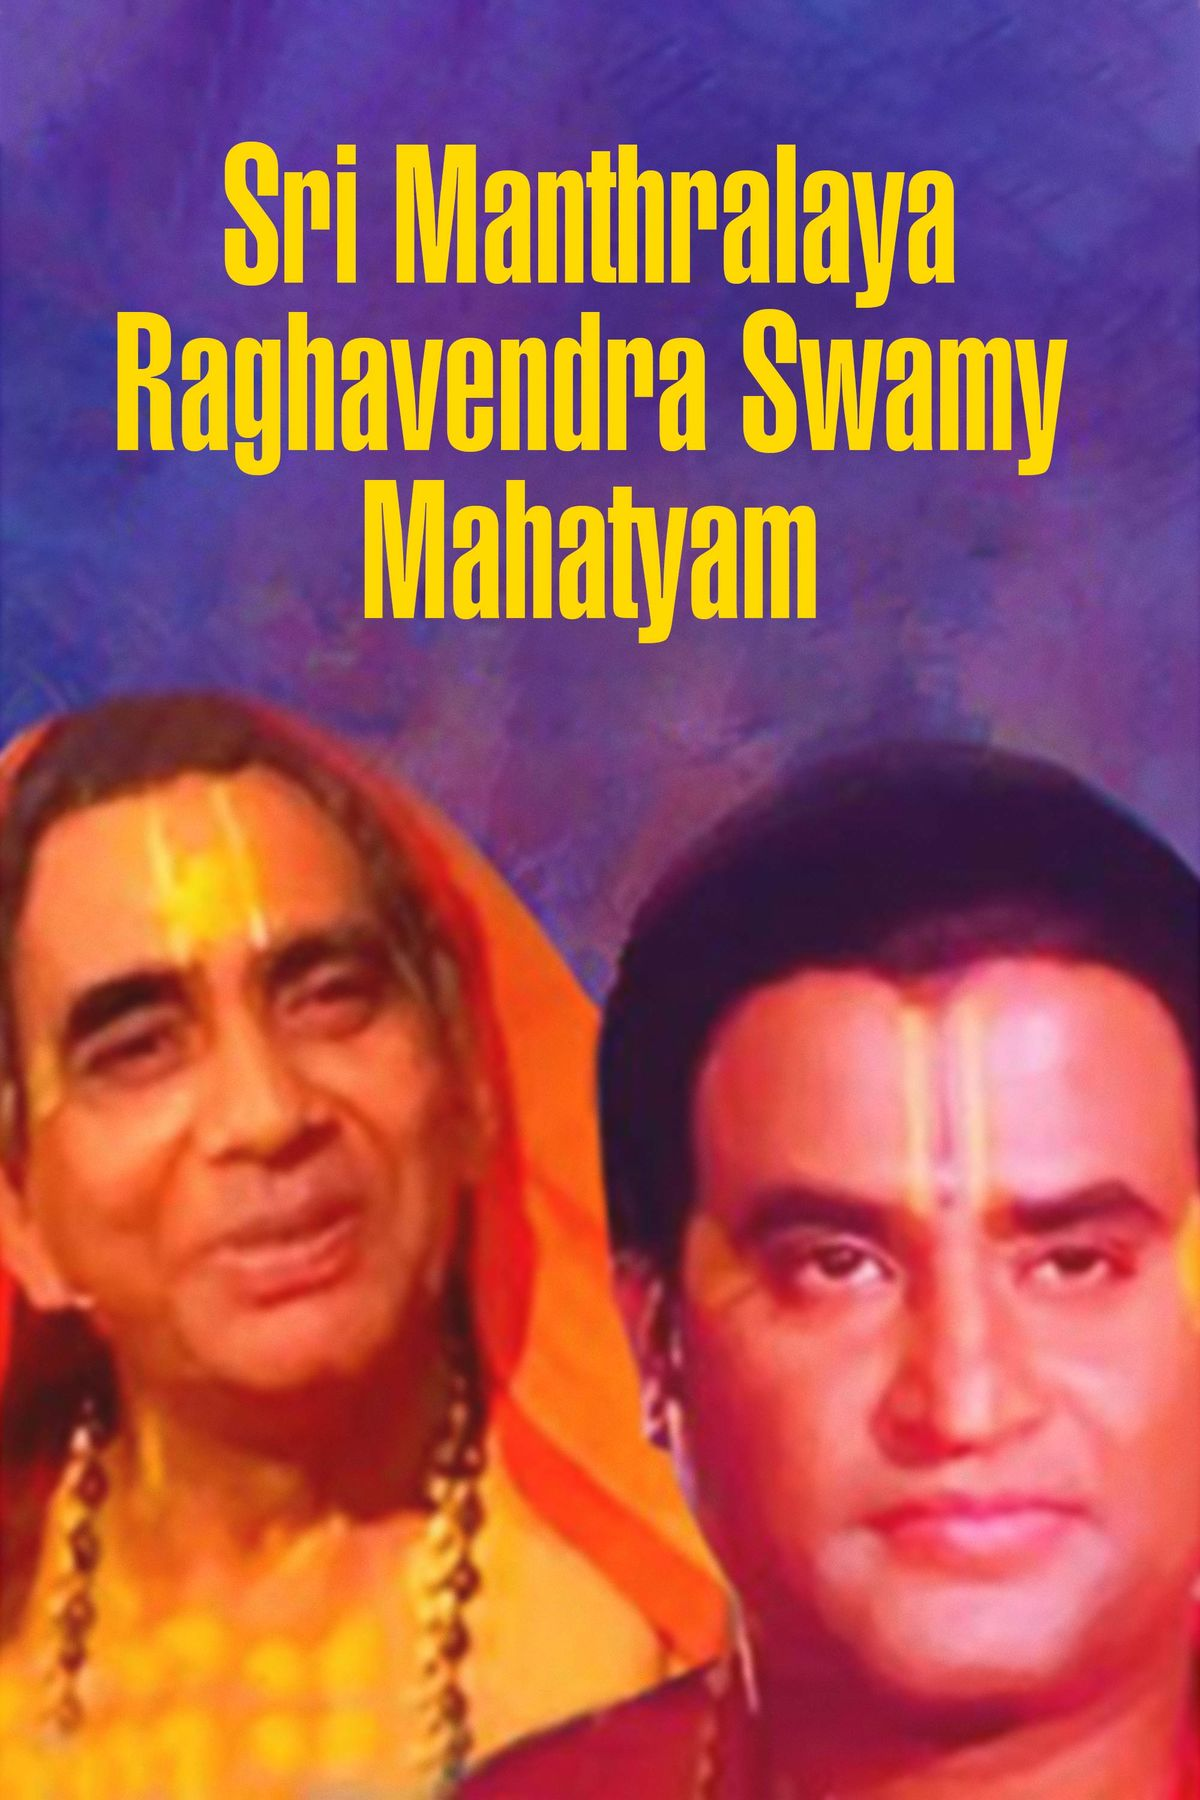 Sri Manthralaya Raghavendra Swamy Mahatyam